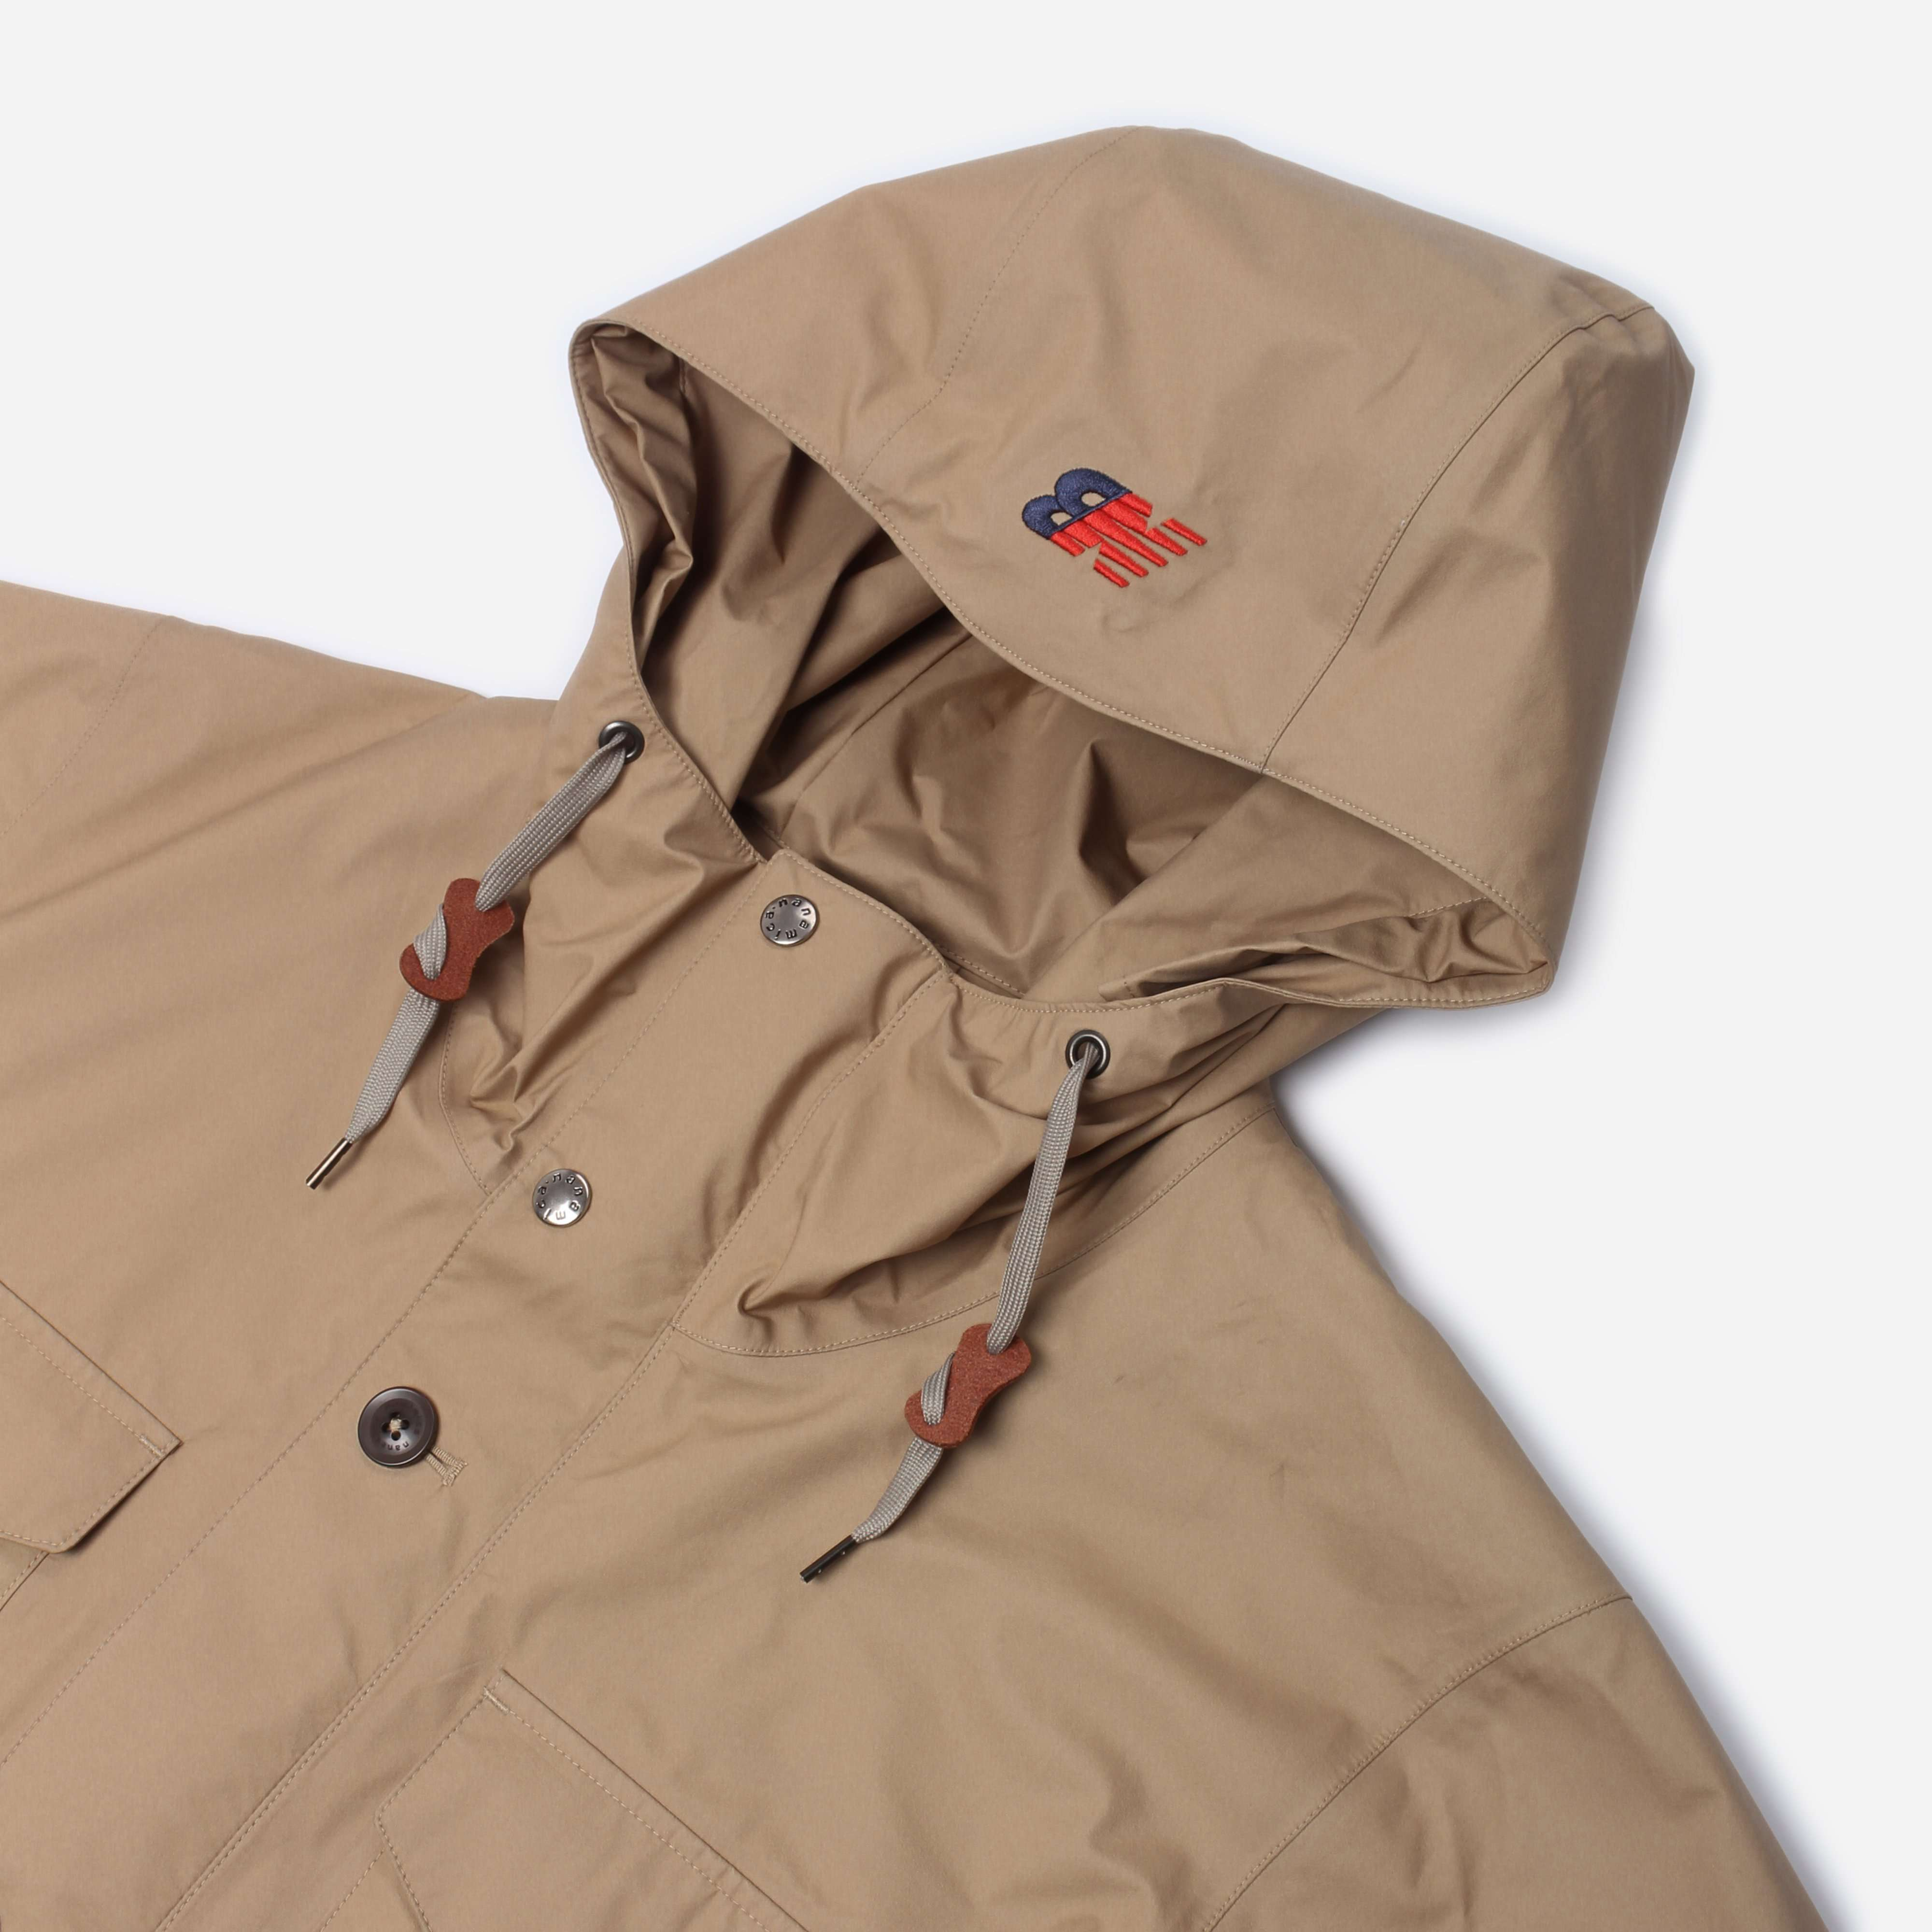 New Balance x Nanamica Gore-Tex Cruiser Jacket